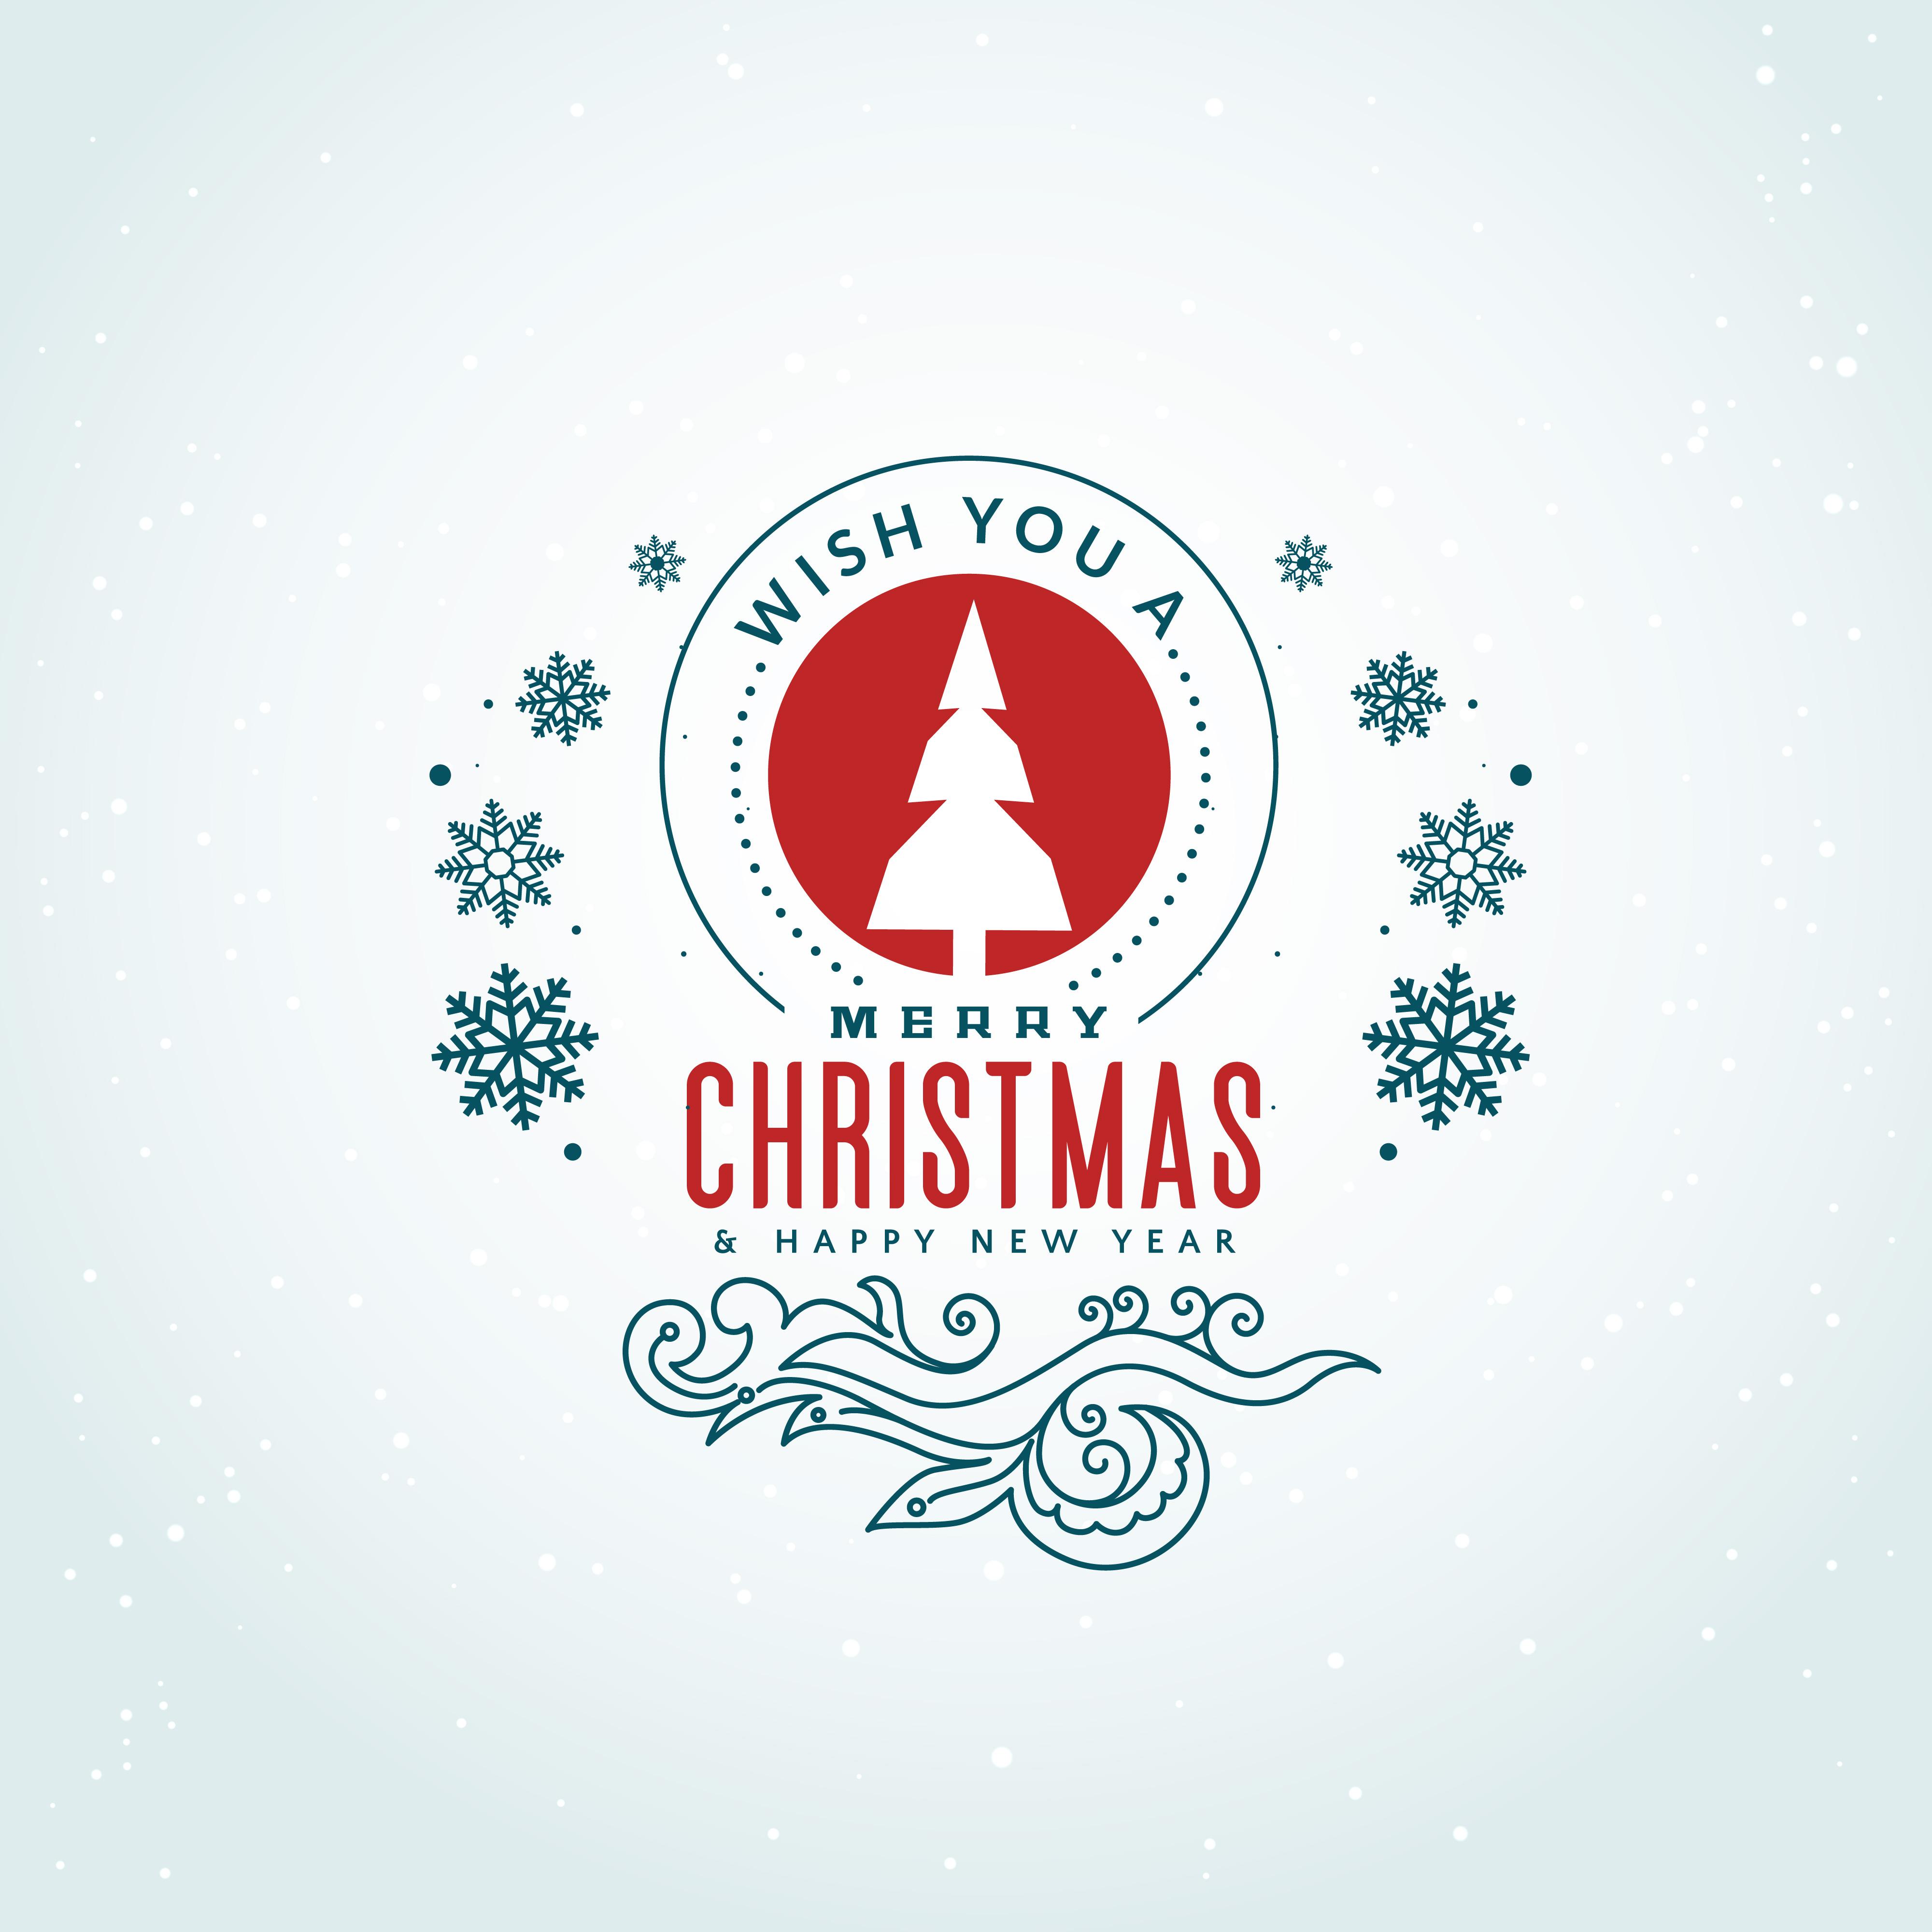 merry christmas design drawings